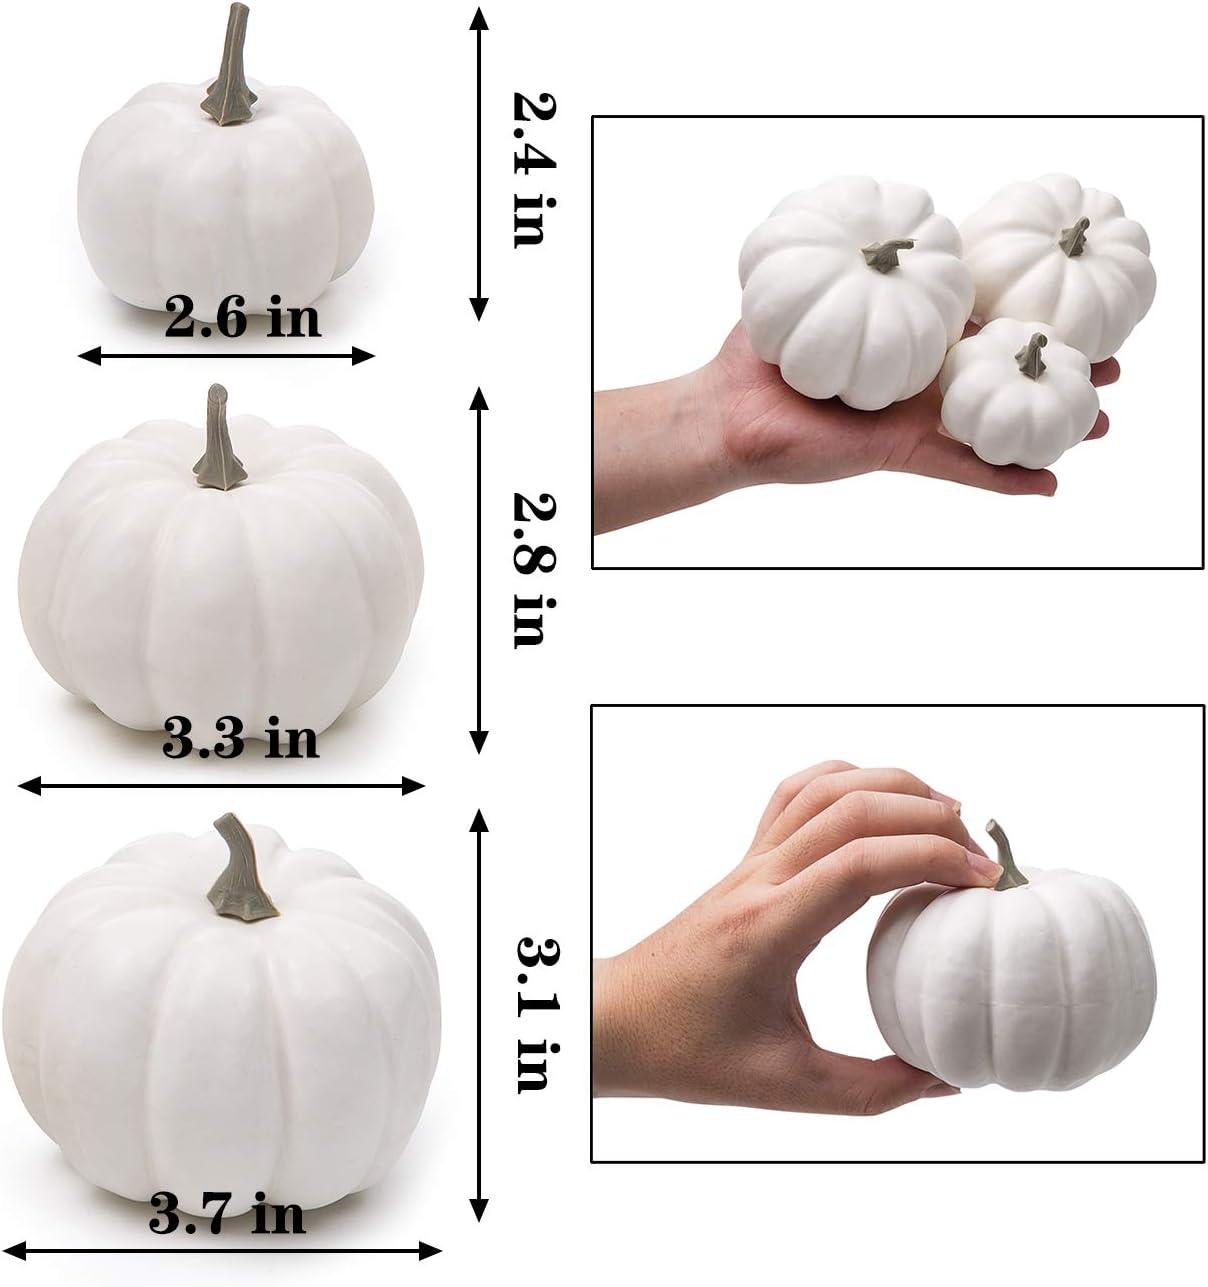 Mini Fake Pumpkins Artificial Vegetables for Halloween,Harvest Thanksgiving Party Decor Orange Ogrmar 12 Pack Artificial Assorted Pumpkins